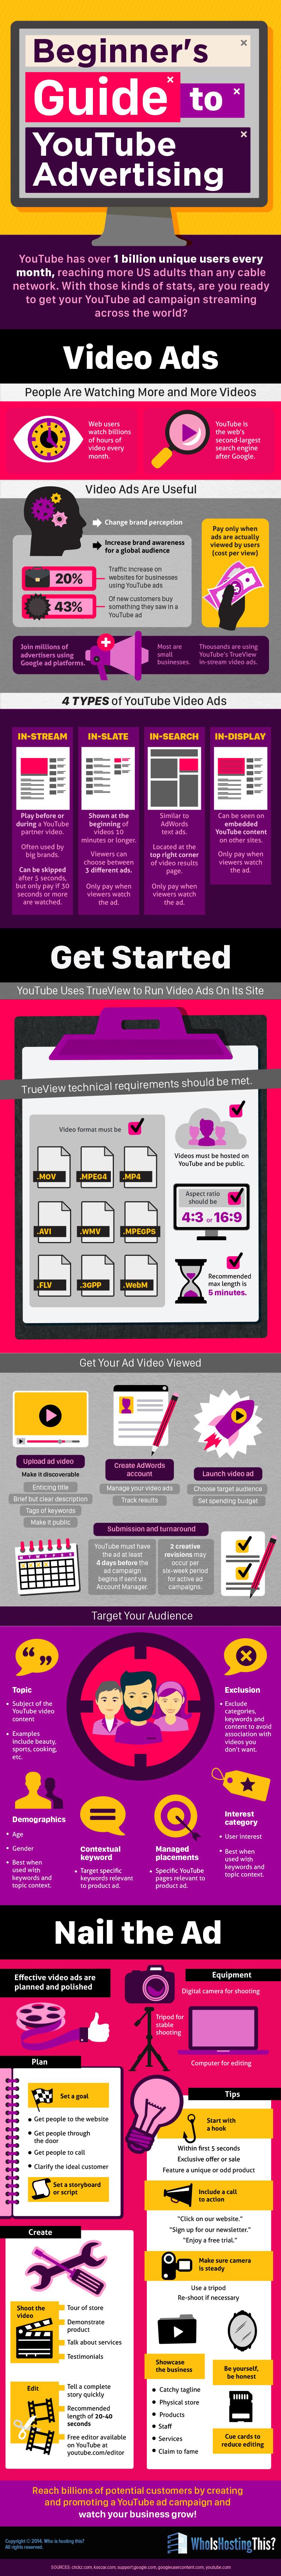 Youtube-Advertising-Tips